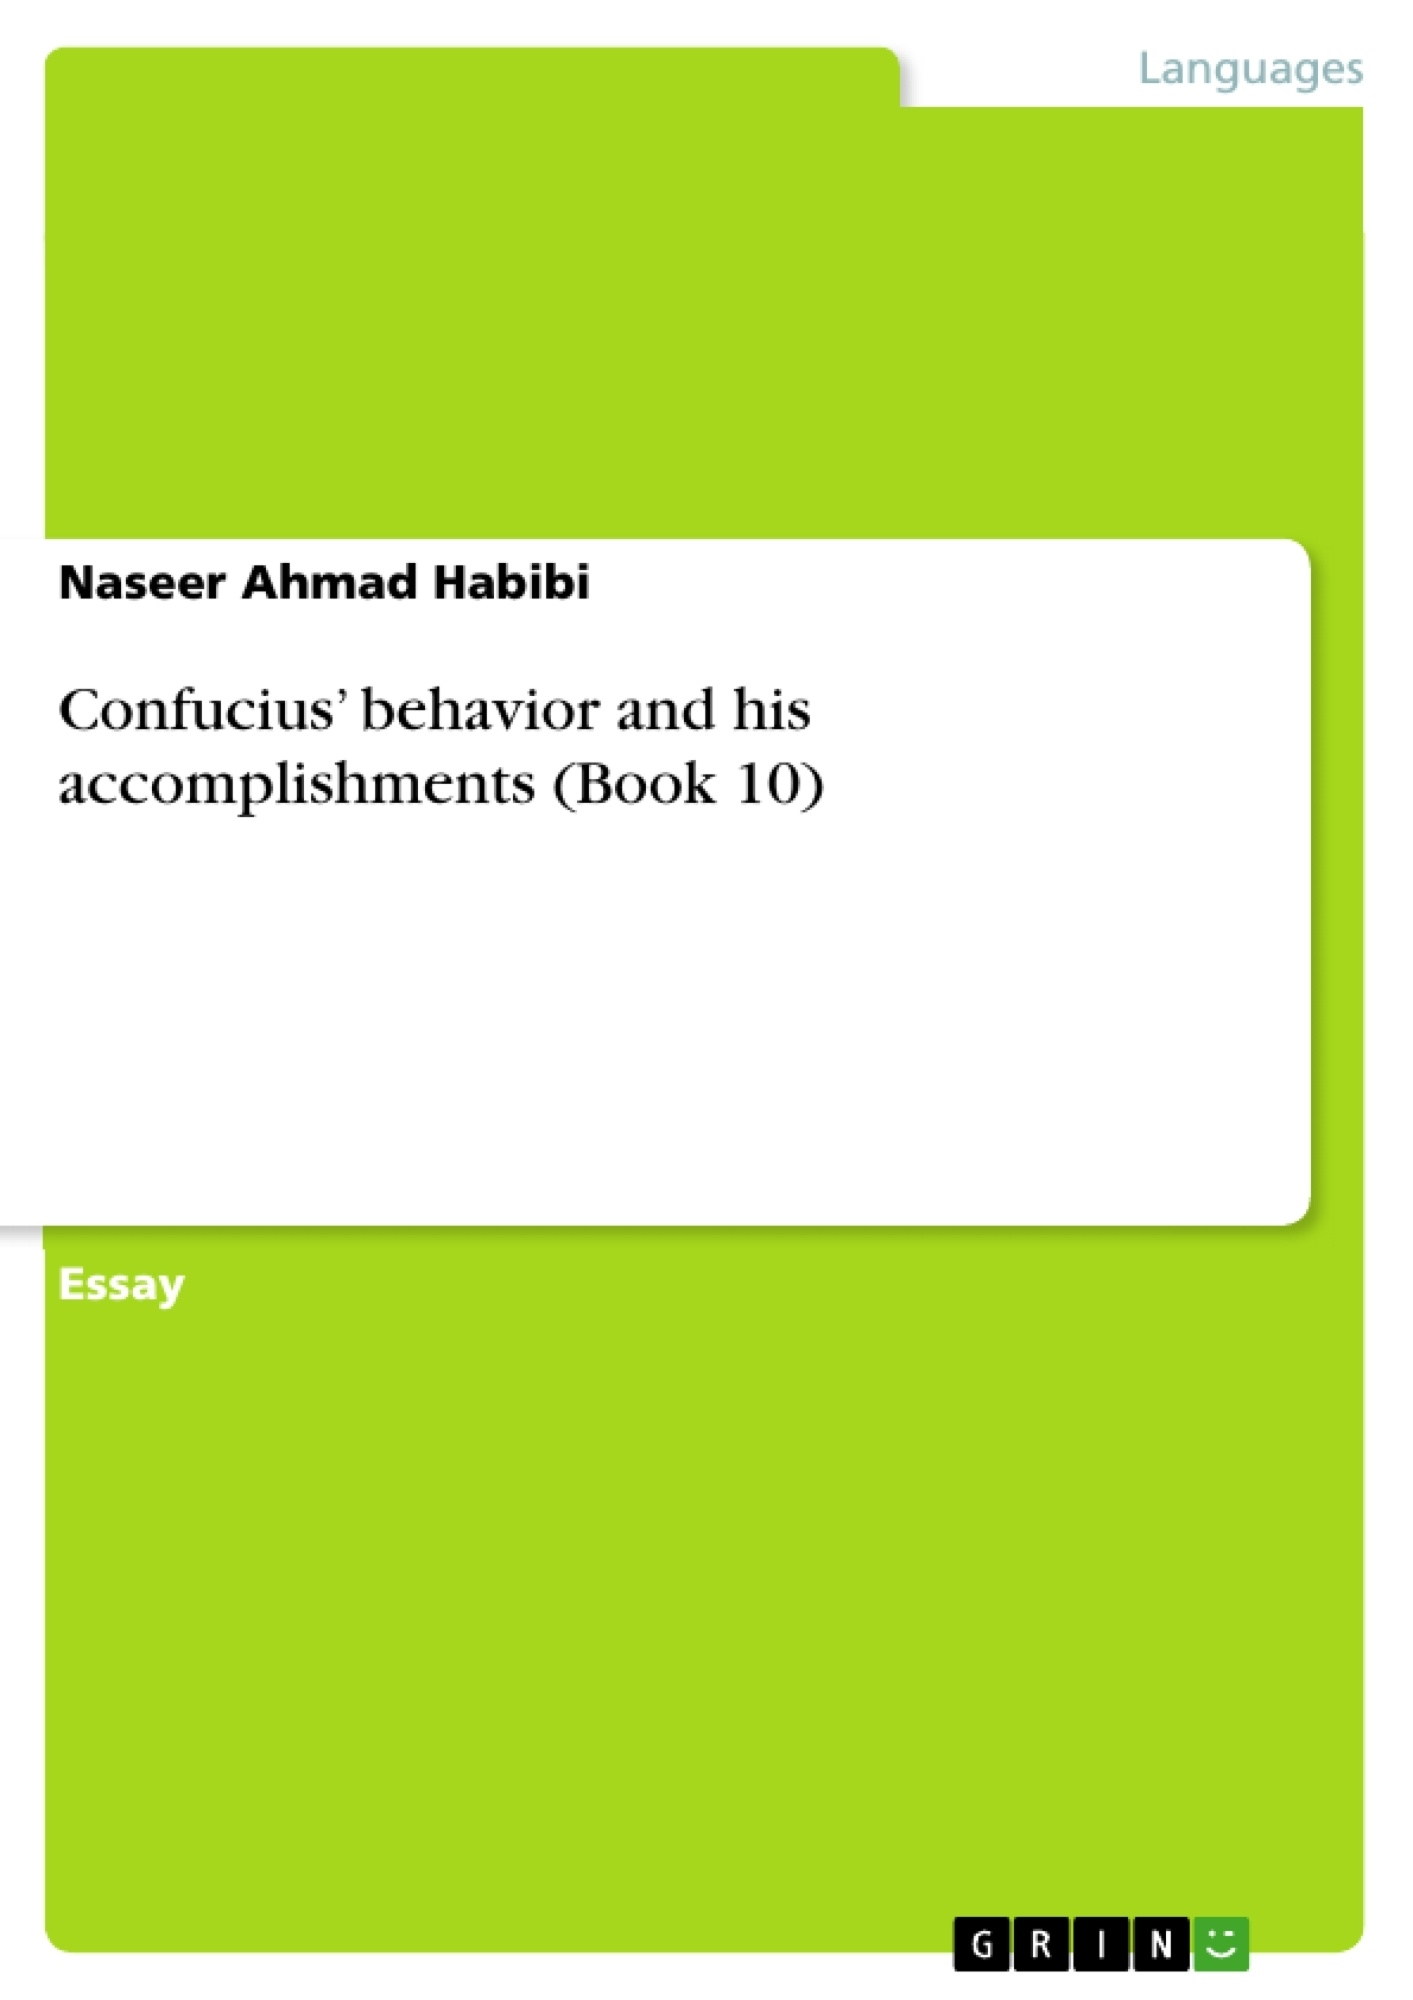 Title: Confucius' behavior and his accomplishments (Book 10)